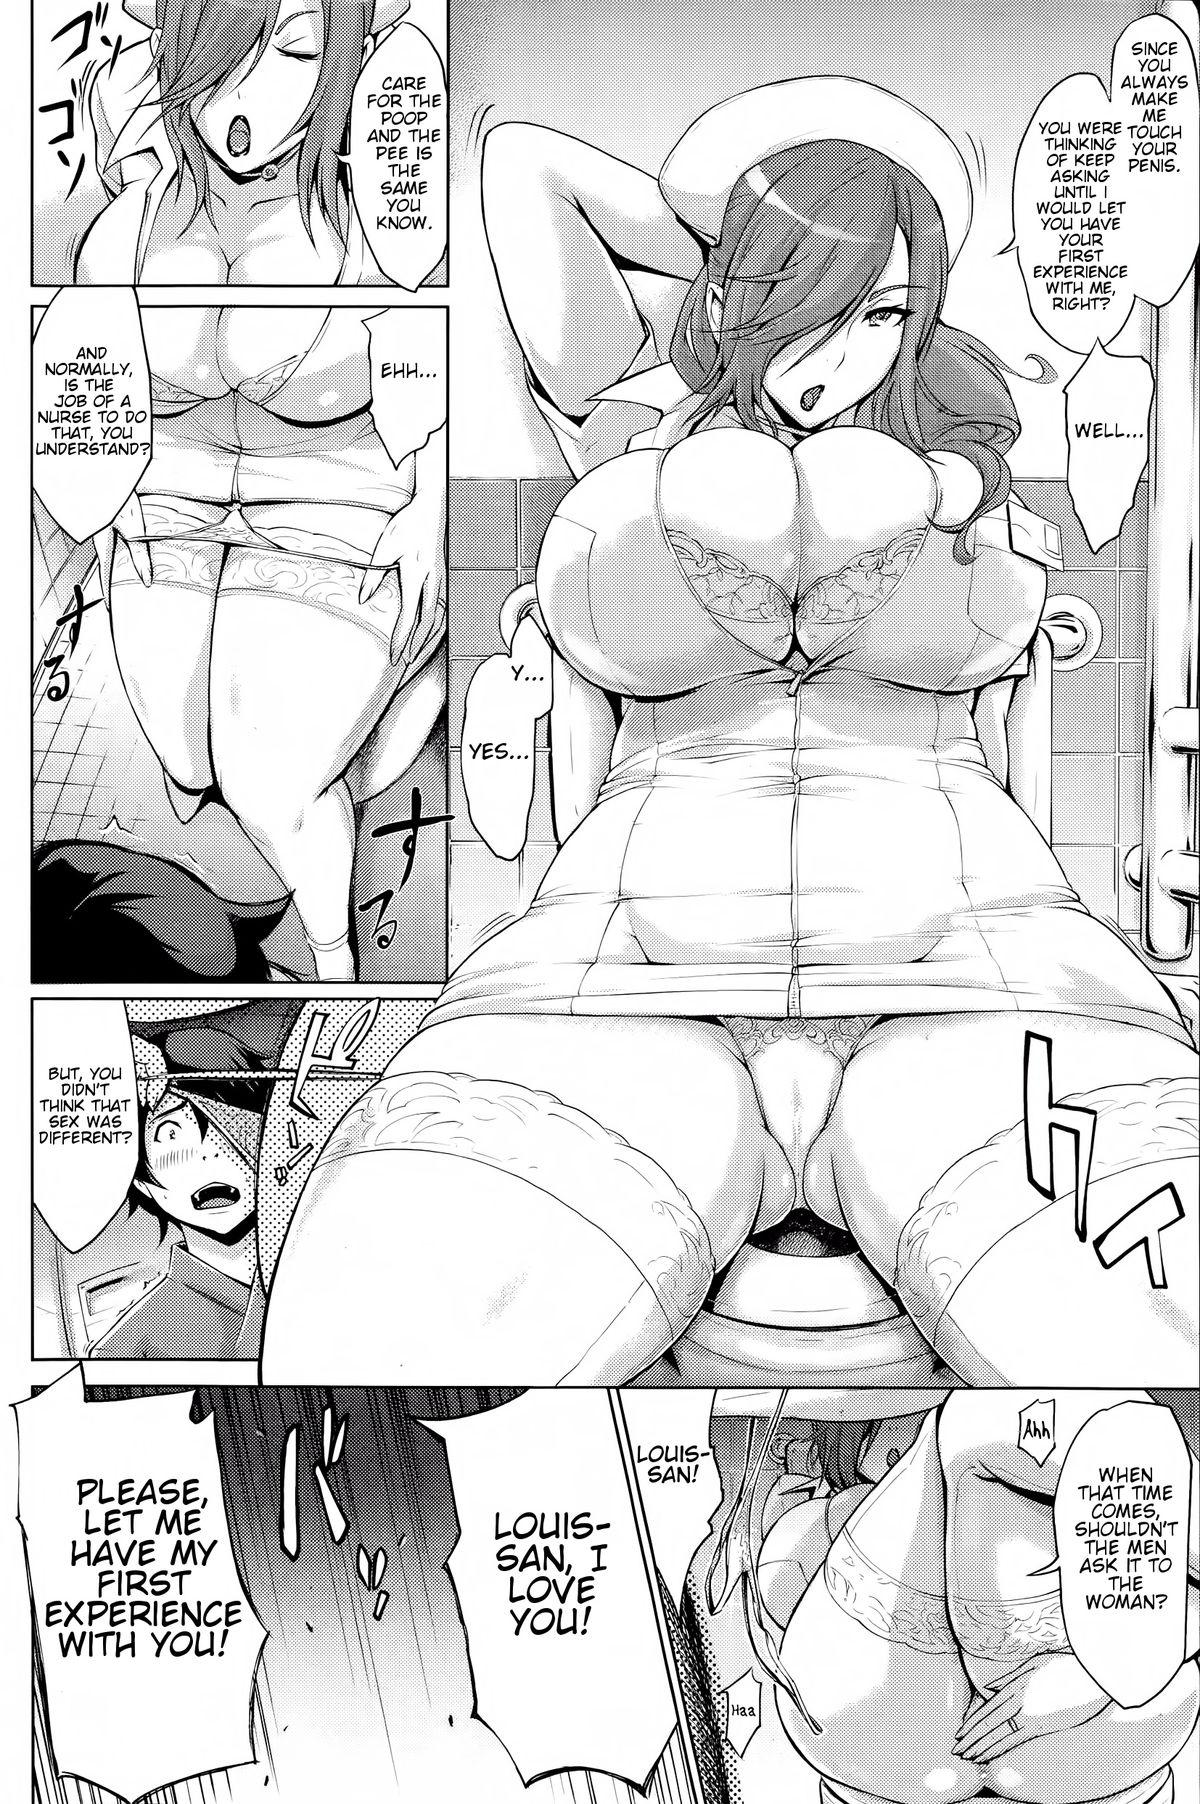 Nurse to Sotsugyou to Pants | Nurse, Graduation and Pants 7